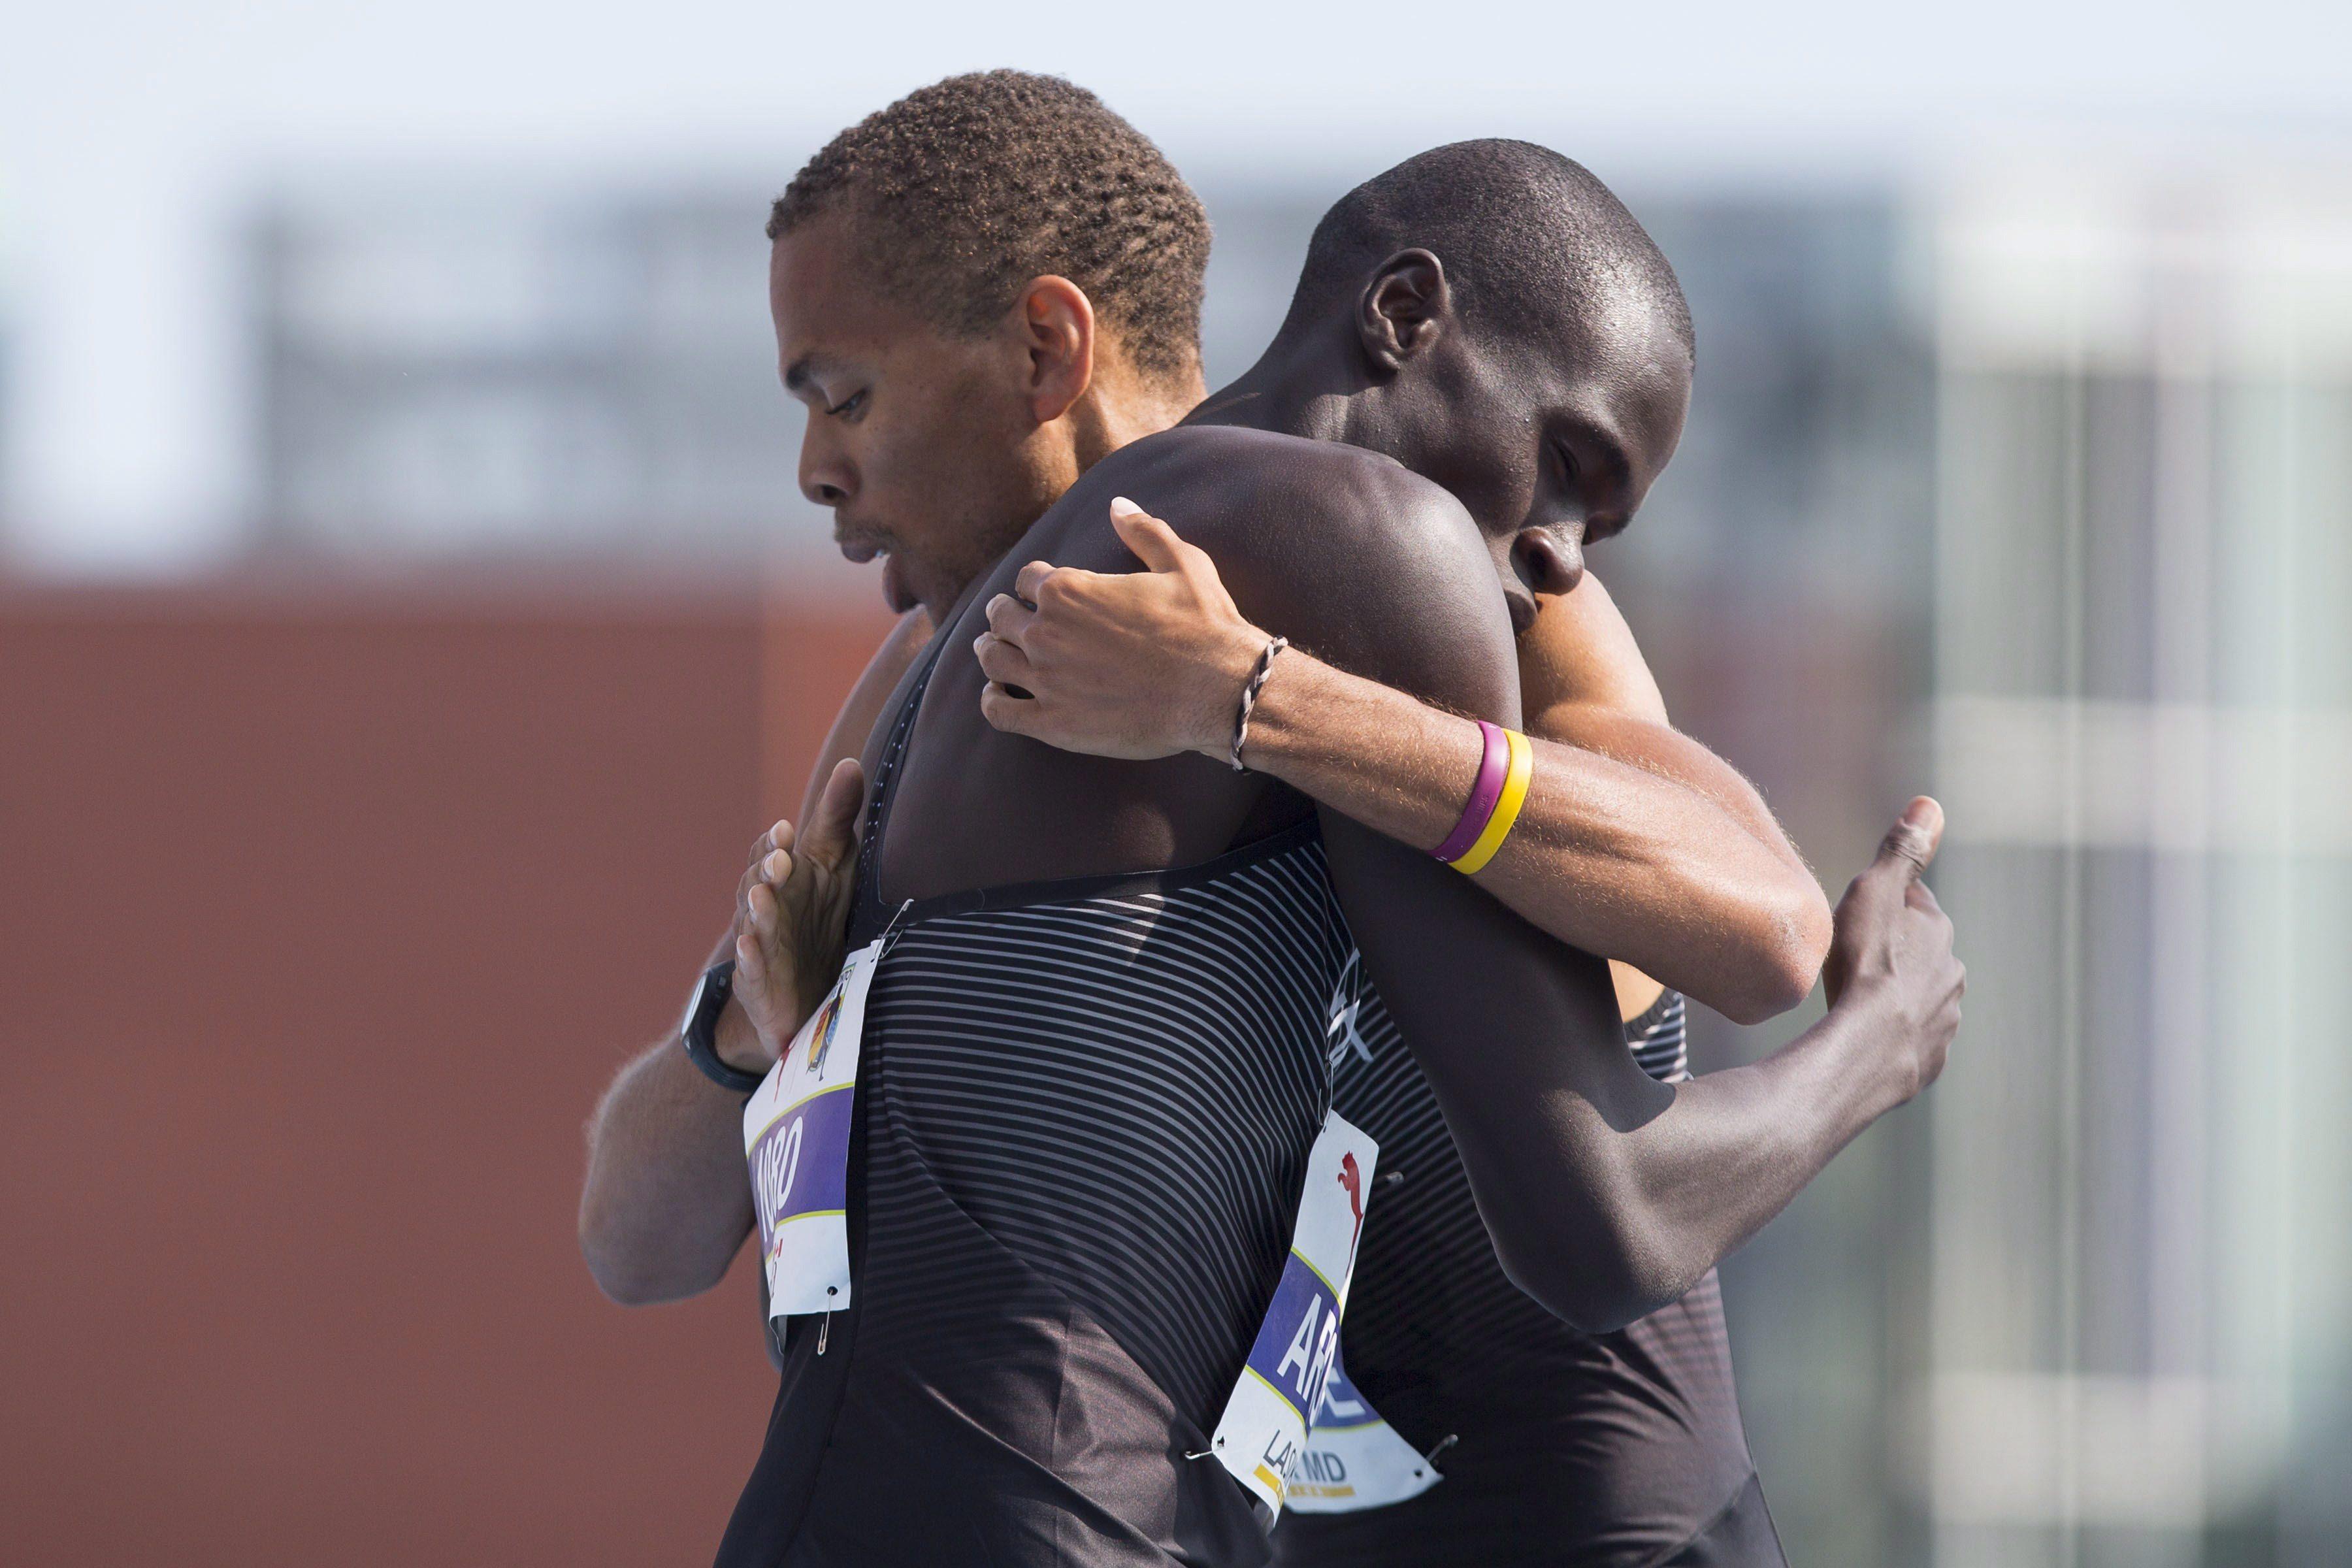 McBride embracing teammate Marco Arop